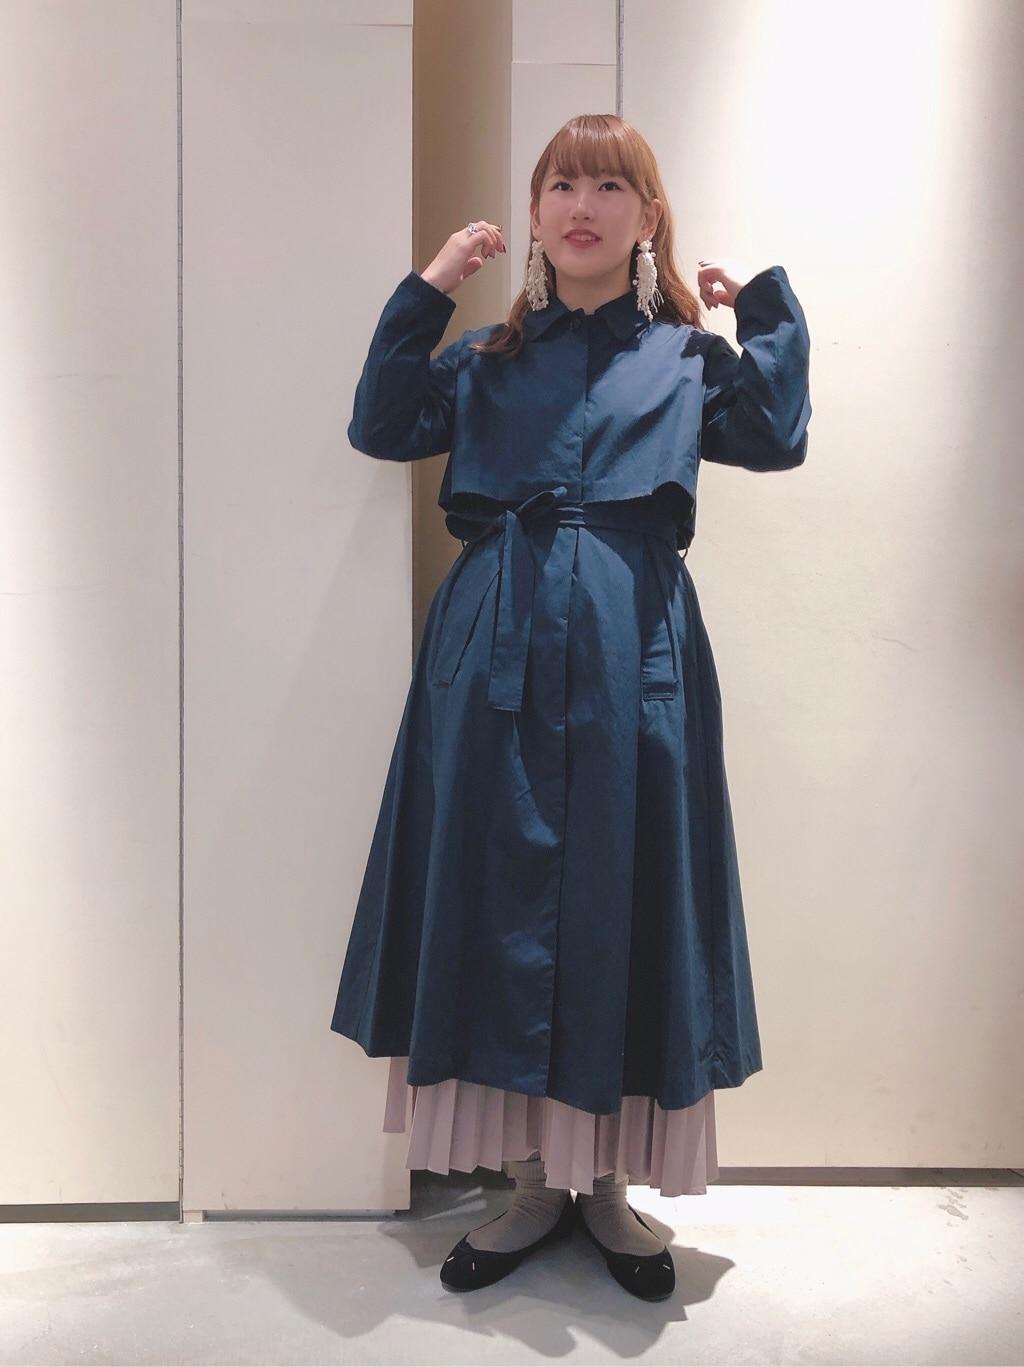 bulle de savon 阪急西宮ガーデンズ 身長:167cm 2019.09.18